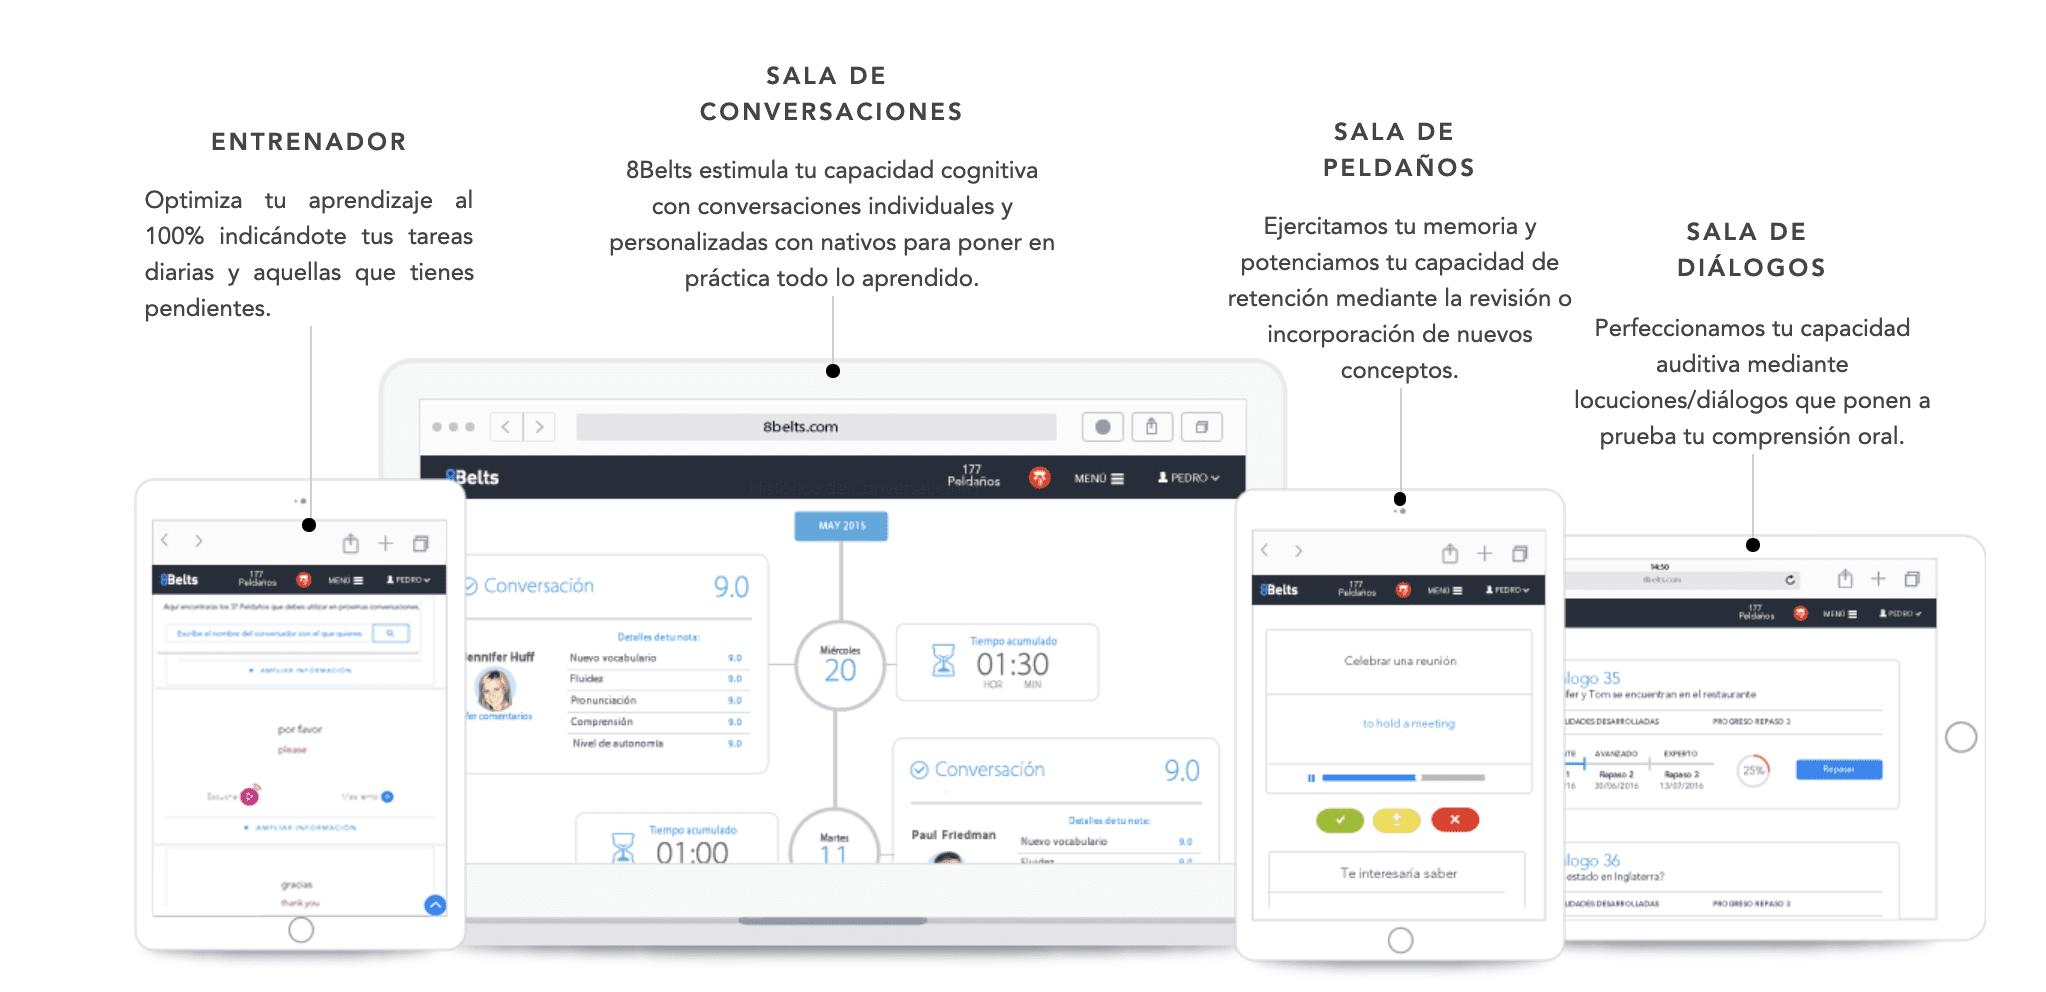 8Belts es una plataforma de estudio online